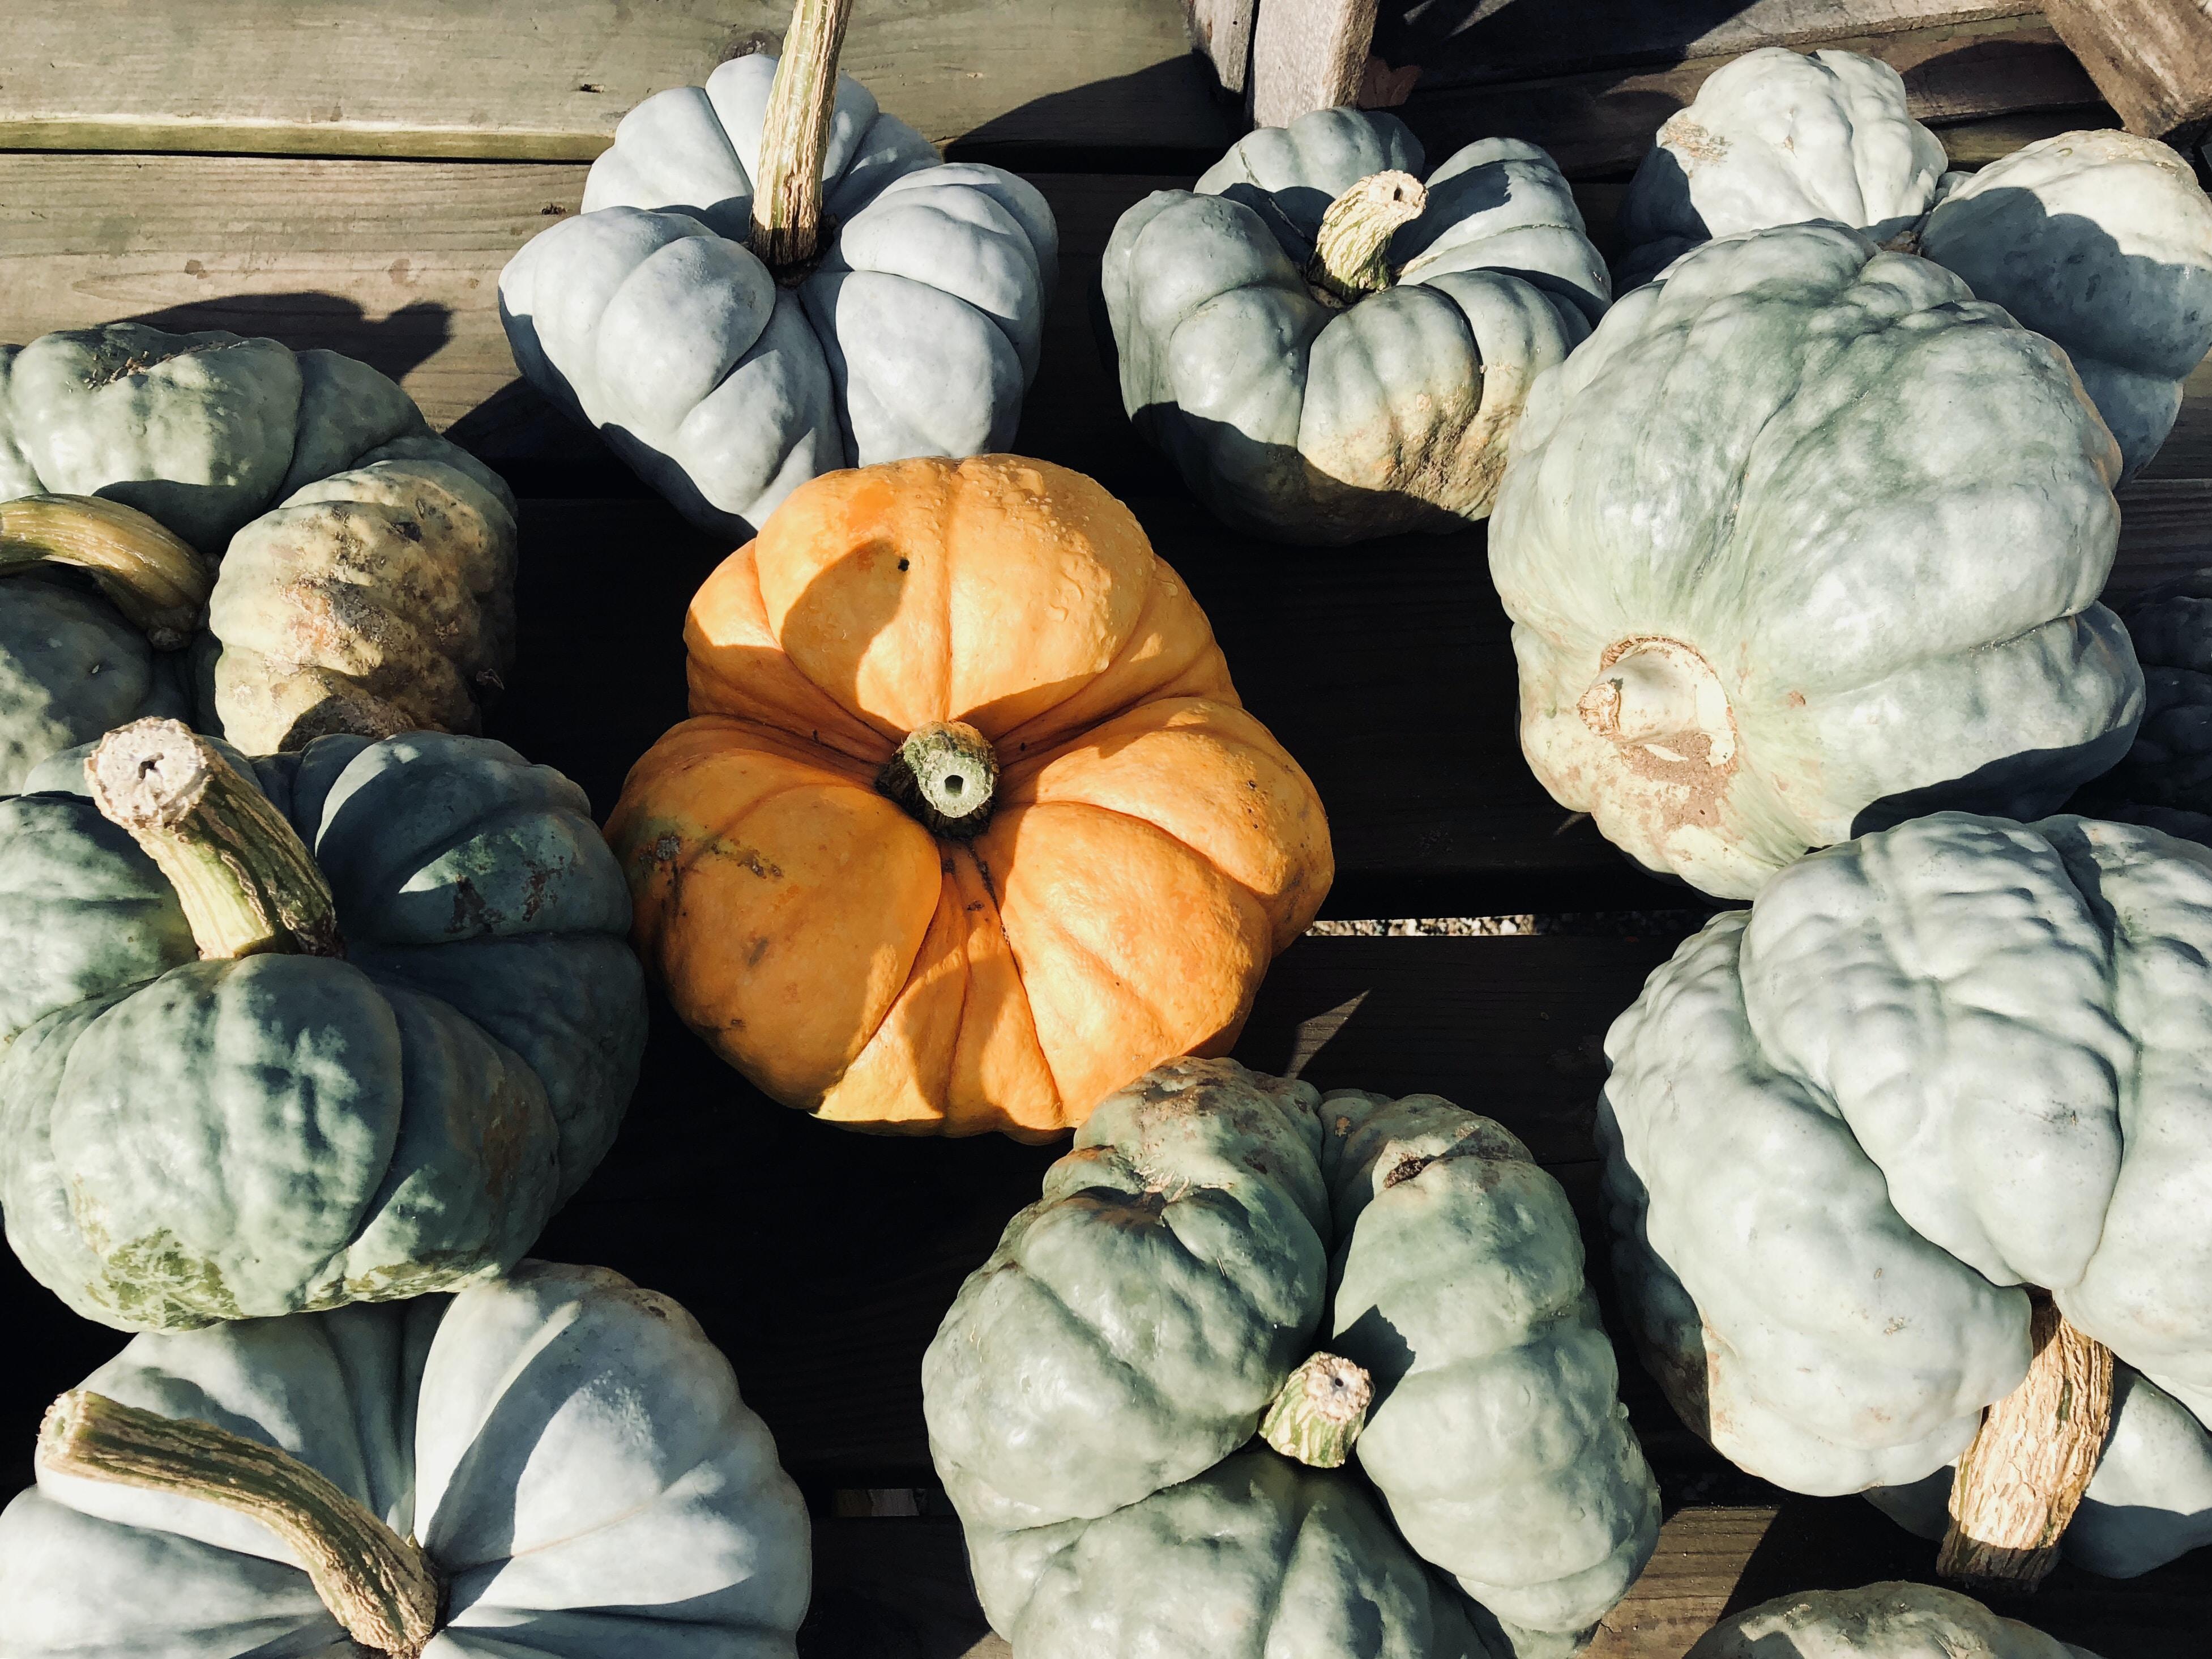 green and orange squash lot